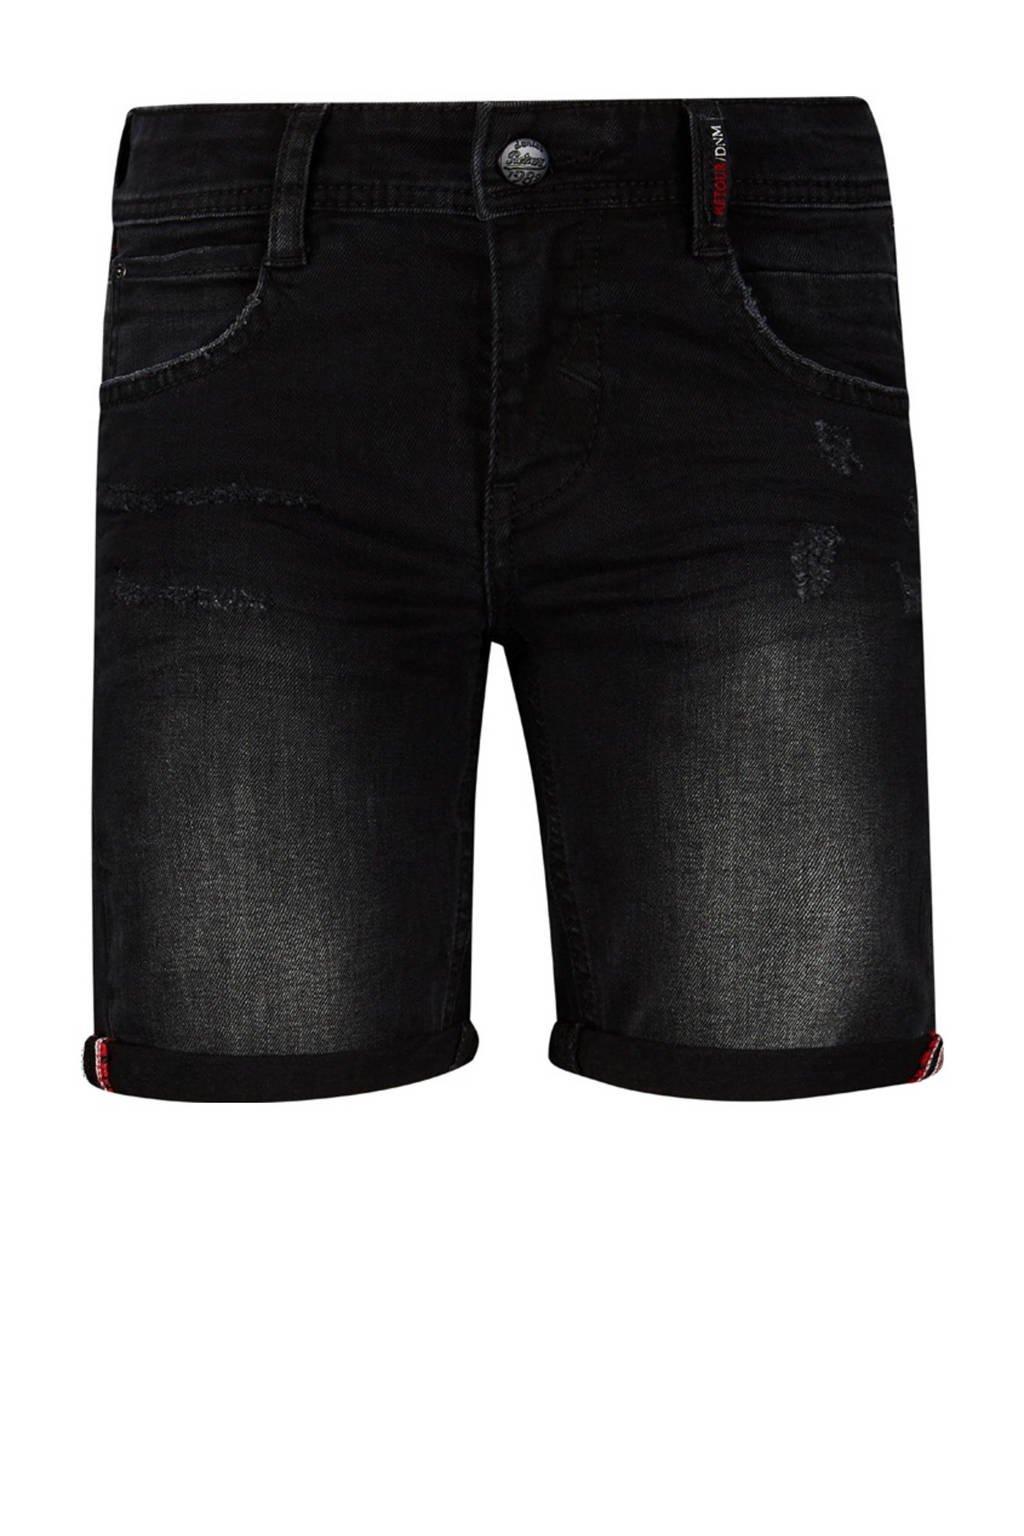 Retour Denim regular fit jeans bermuda Reve black denim, Black denim